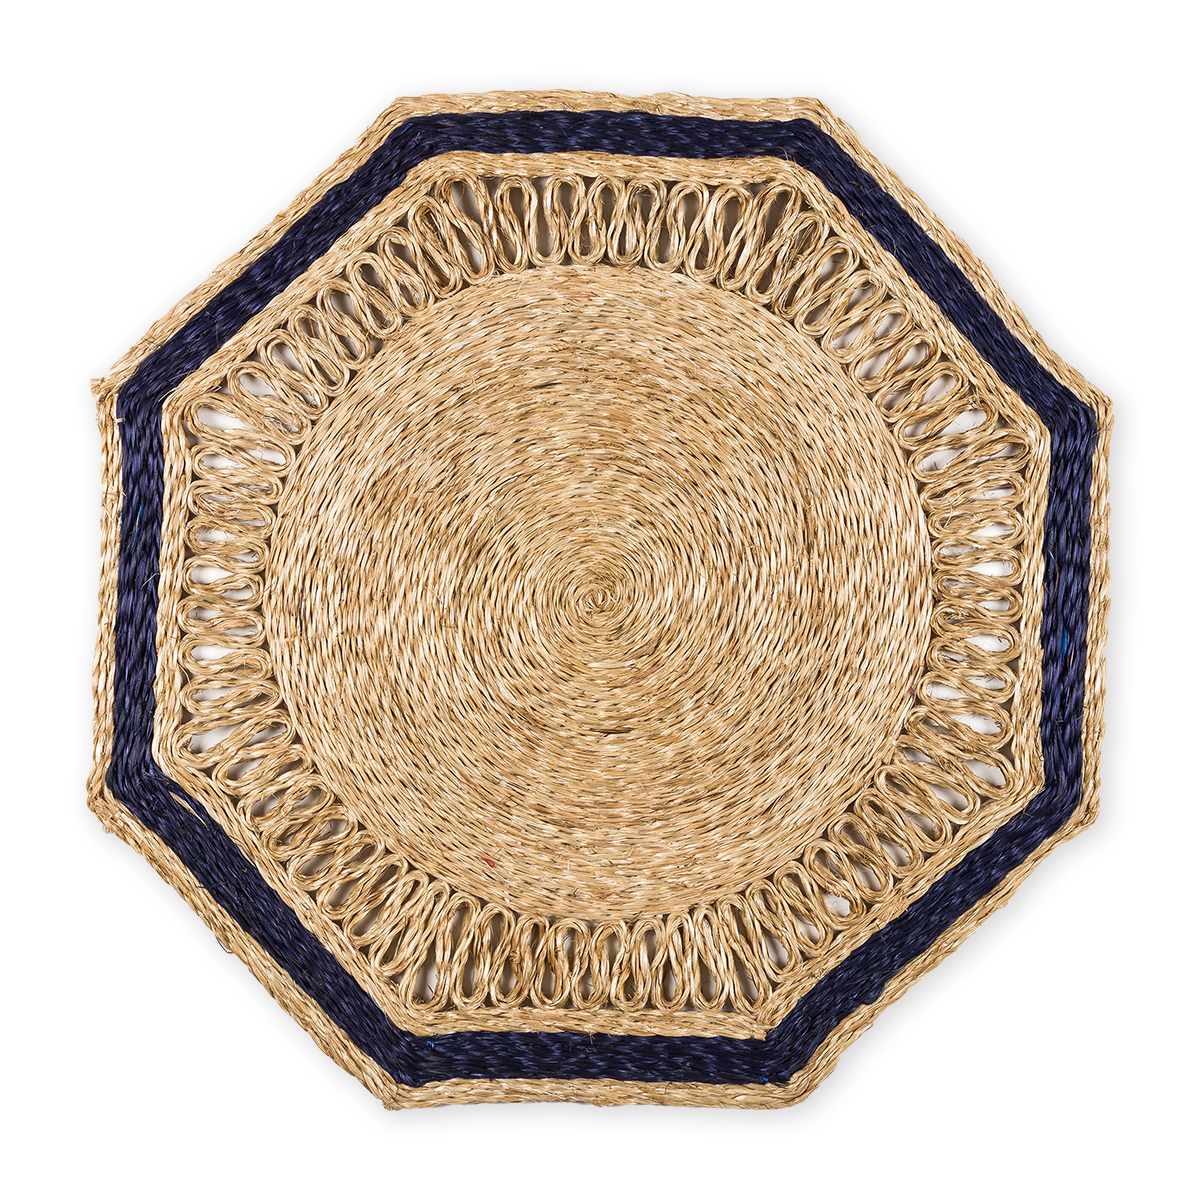 Octagonal Woven Placemats